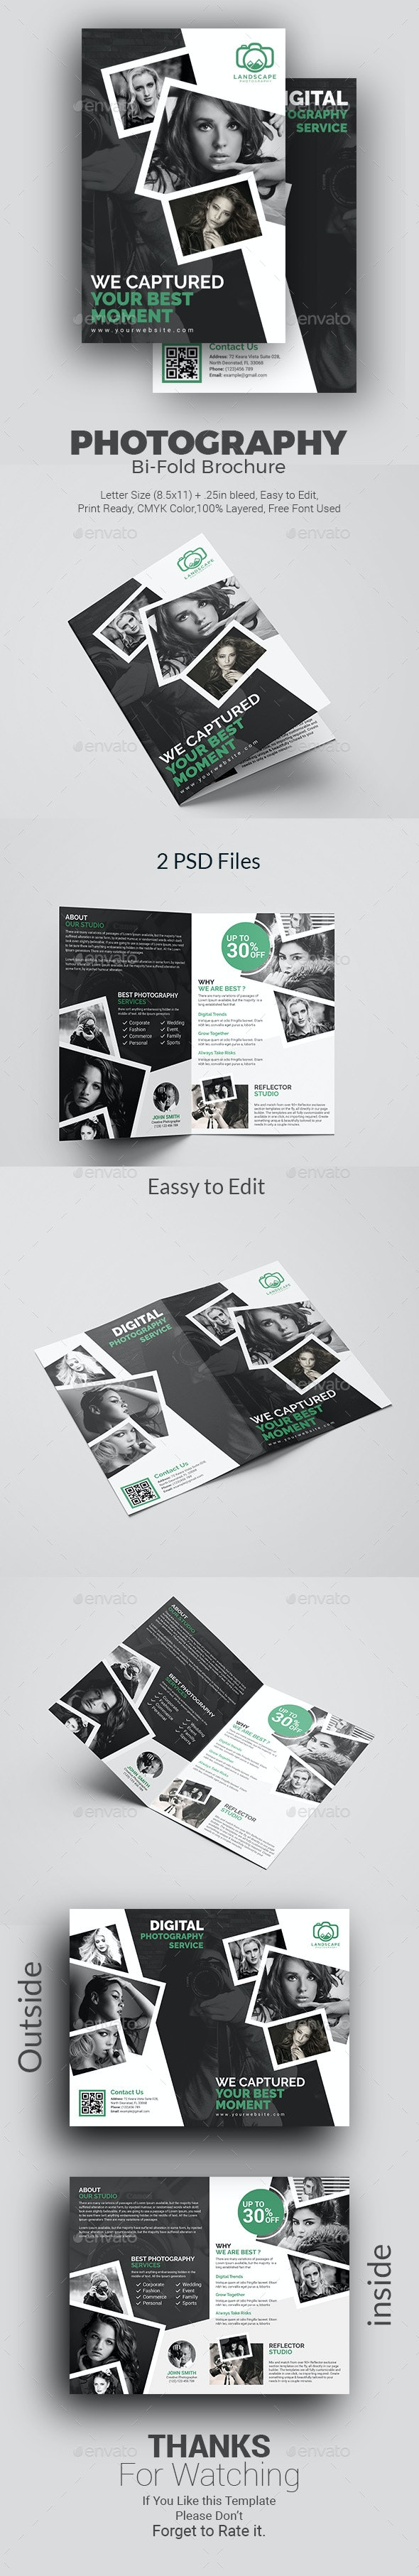 Photography Bi-Fold Brochure - Corporate Brochures